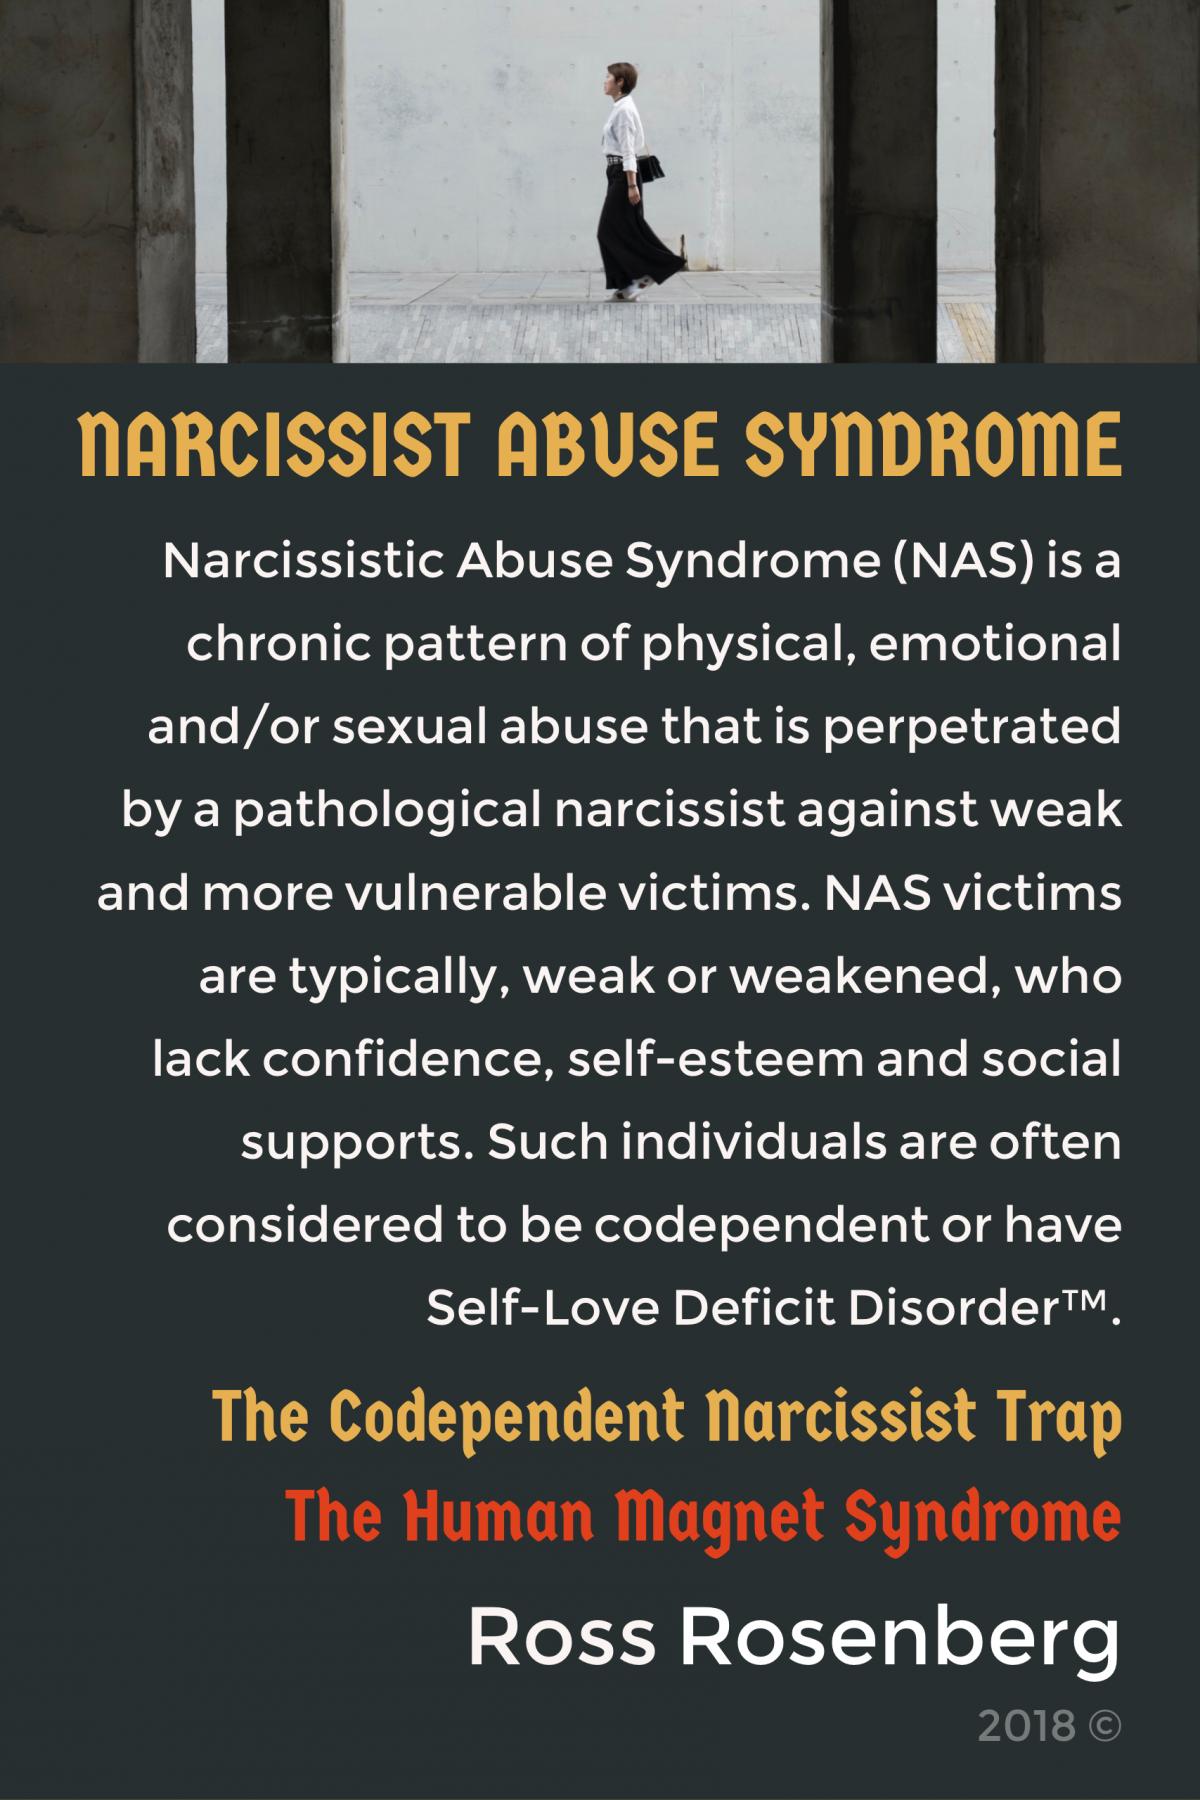 Magnet for narcissists